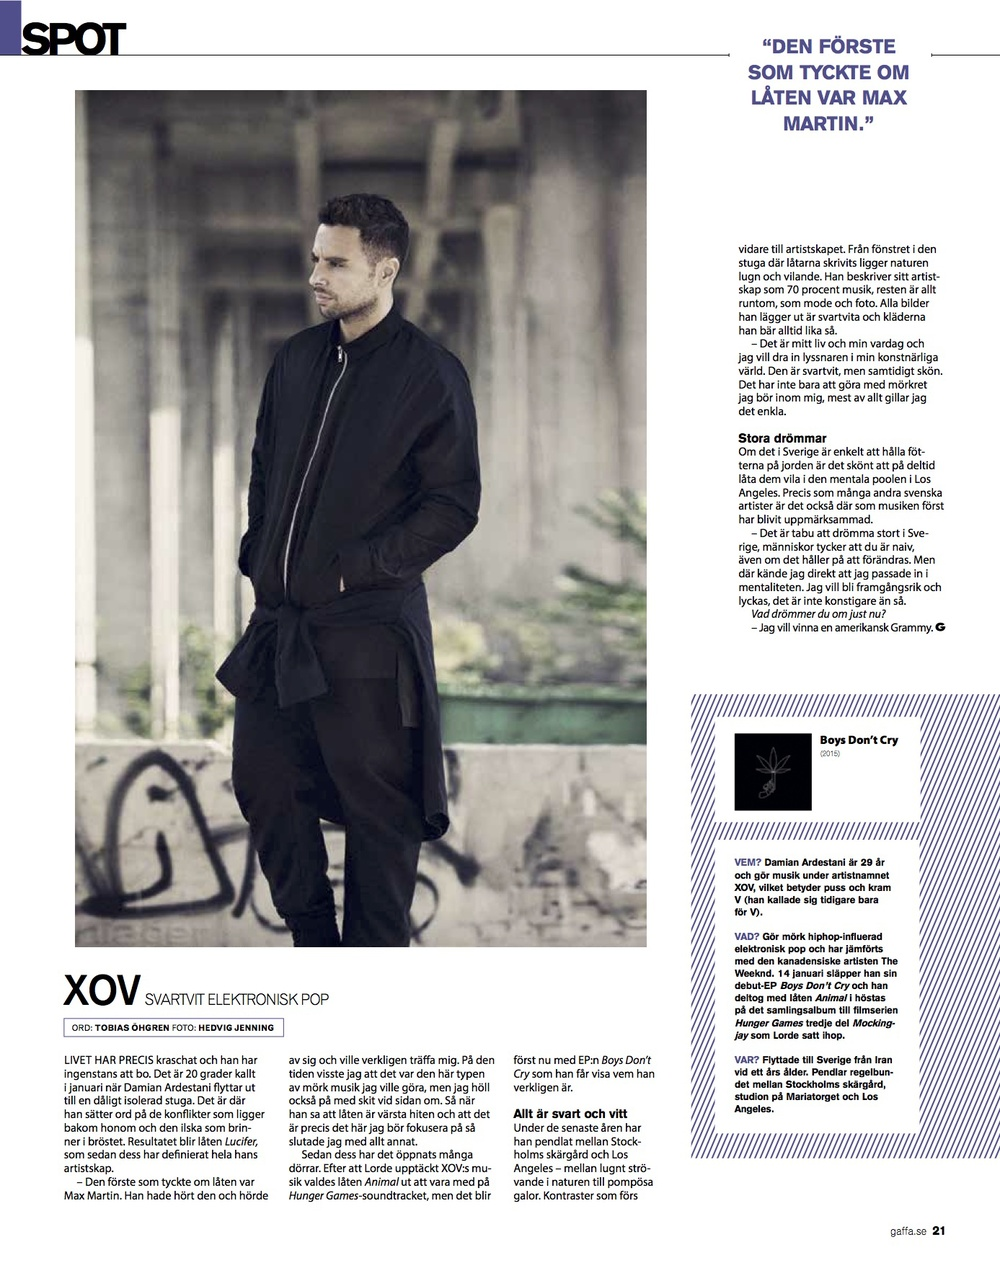 Gaffa SPOT intervju - XOV.jpg